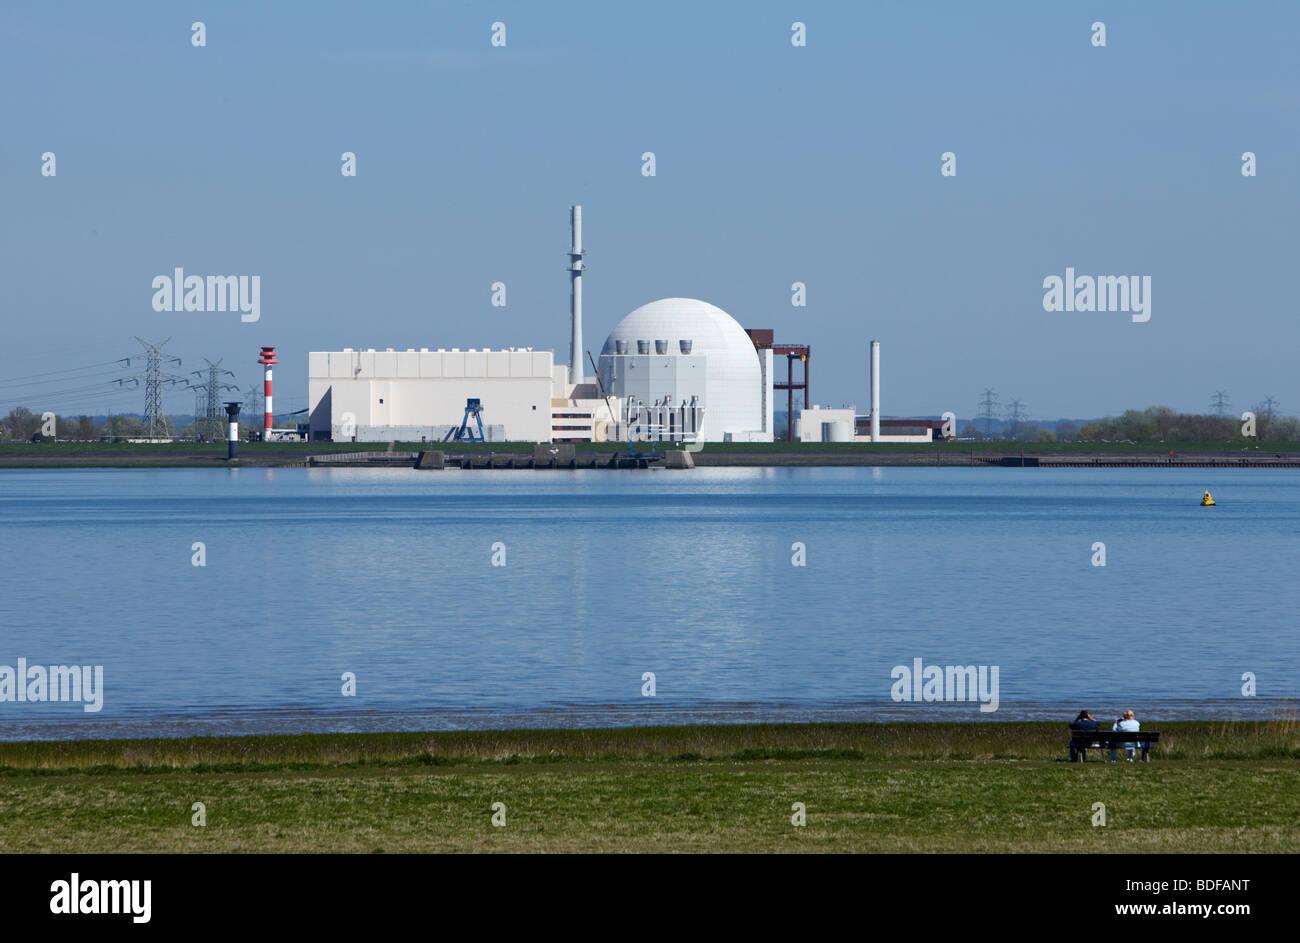 Kernkraftwerk, Brokdorf, Deutschland, Germany - Stock Image